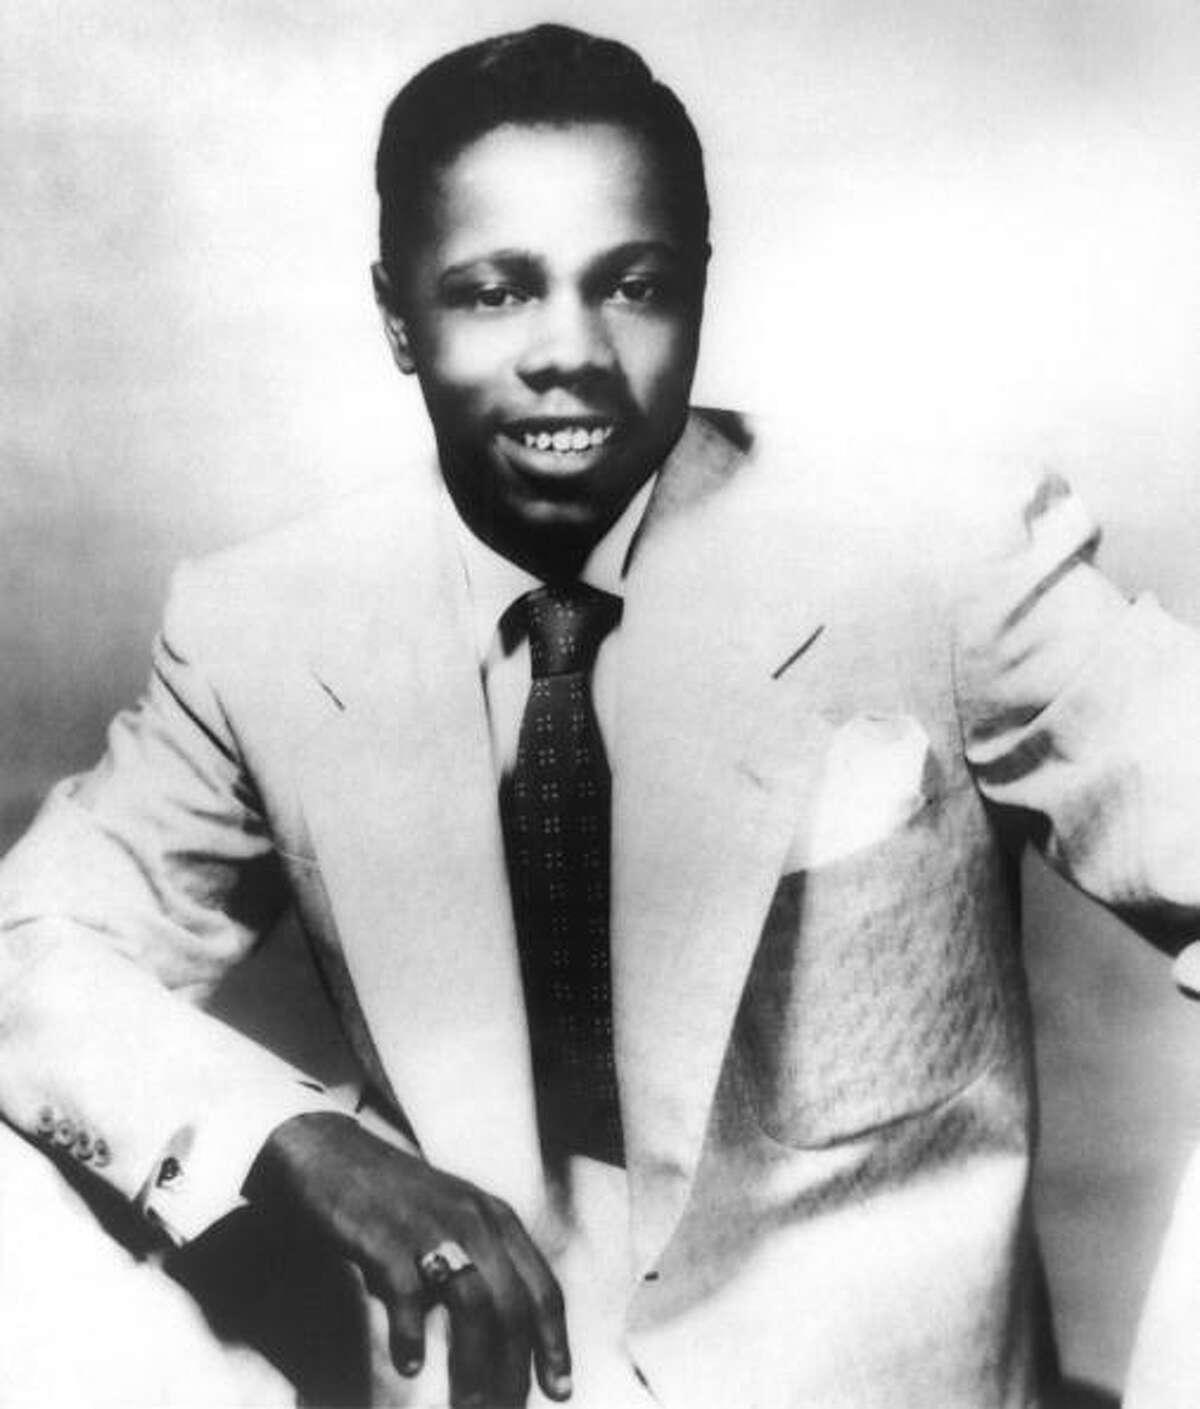 1954: Rhythm and blues recording star Johnny Ace